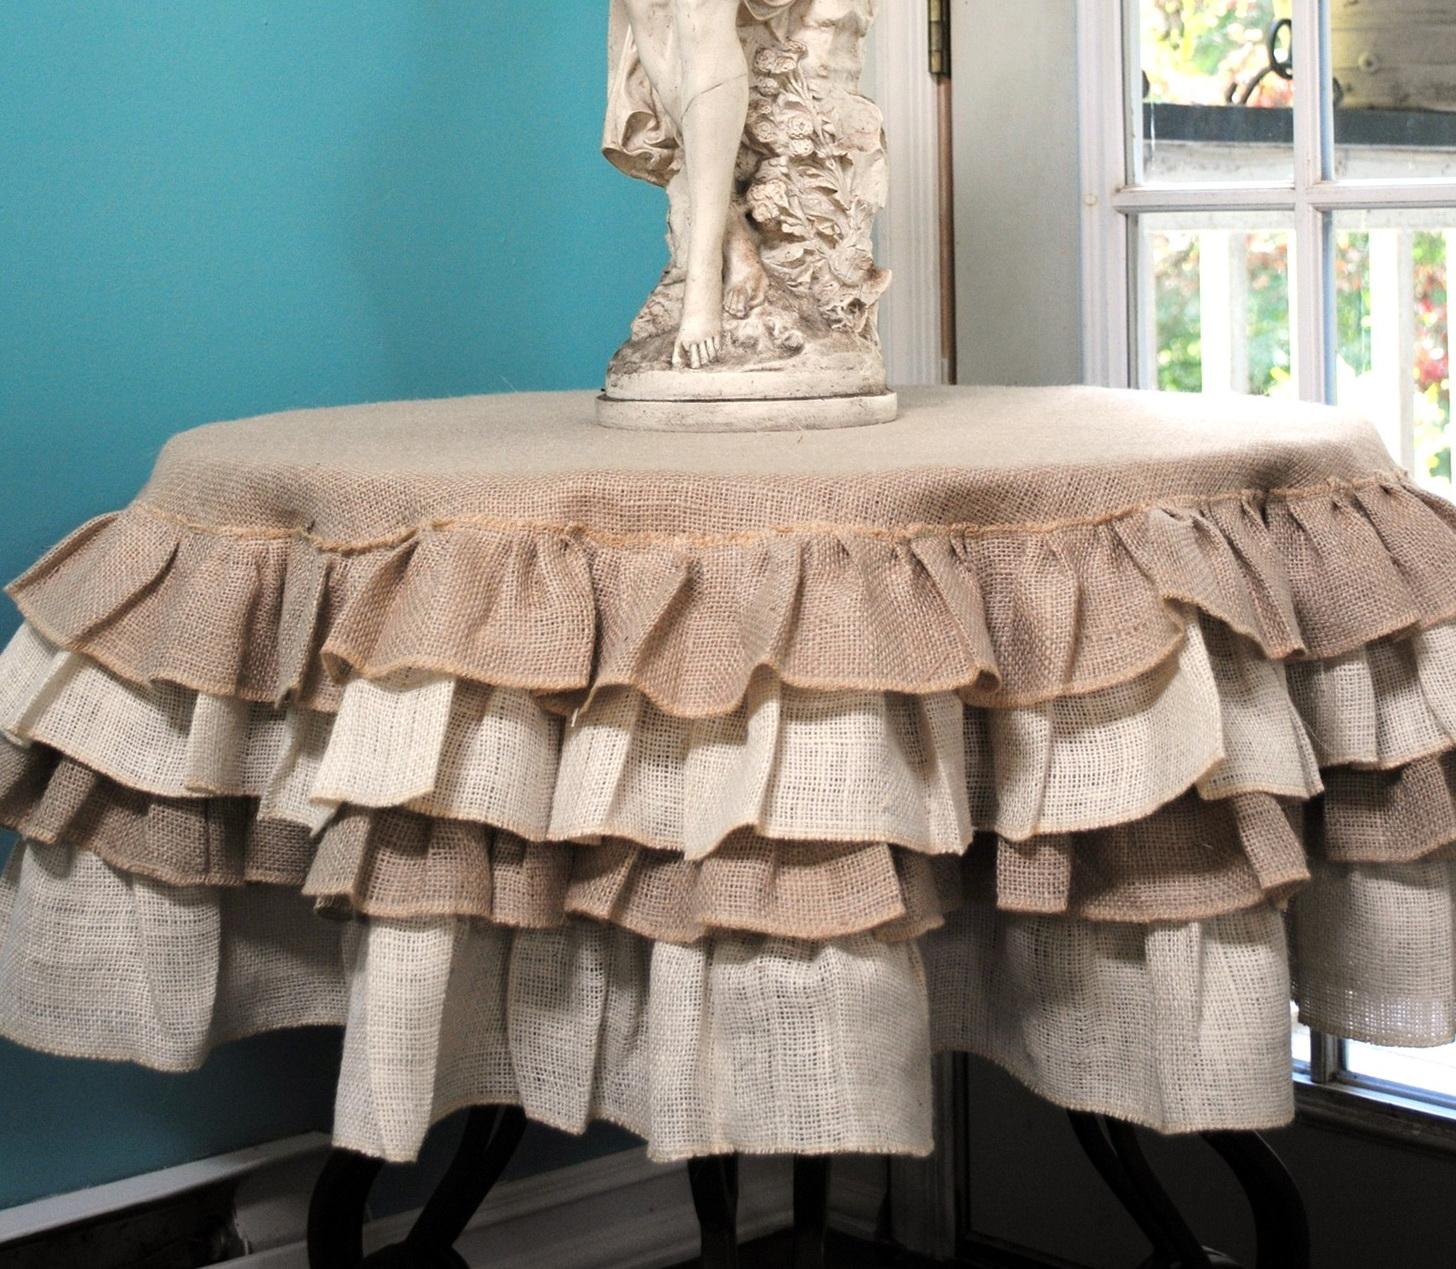 Linen Table Cloths Factory